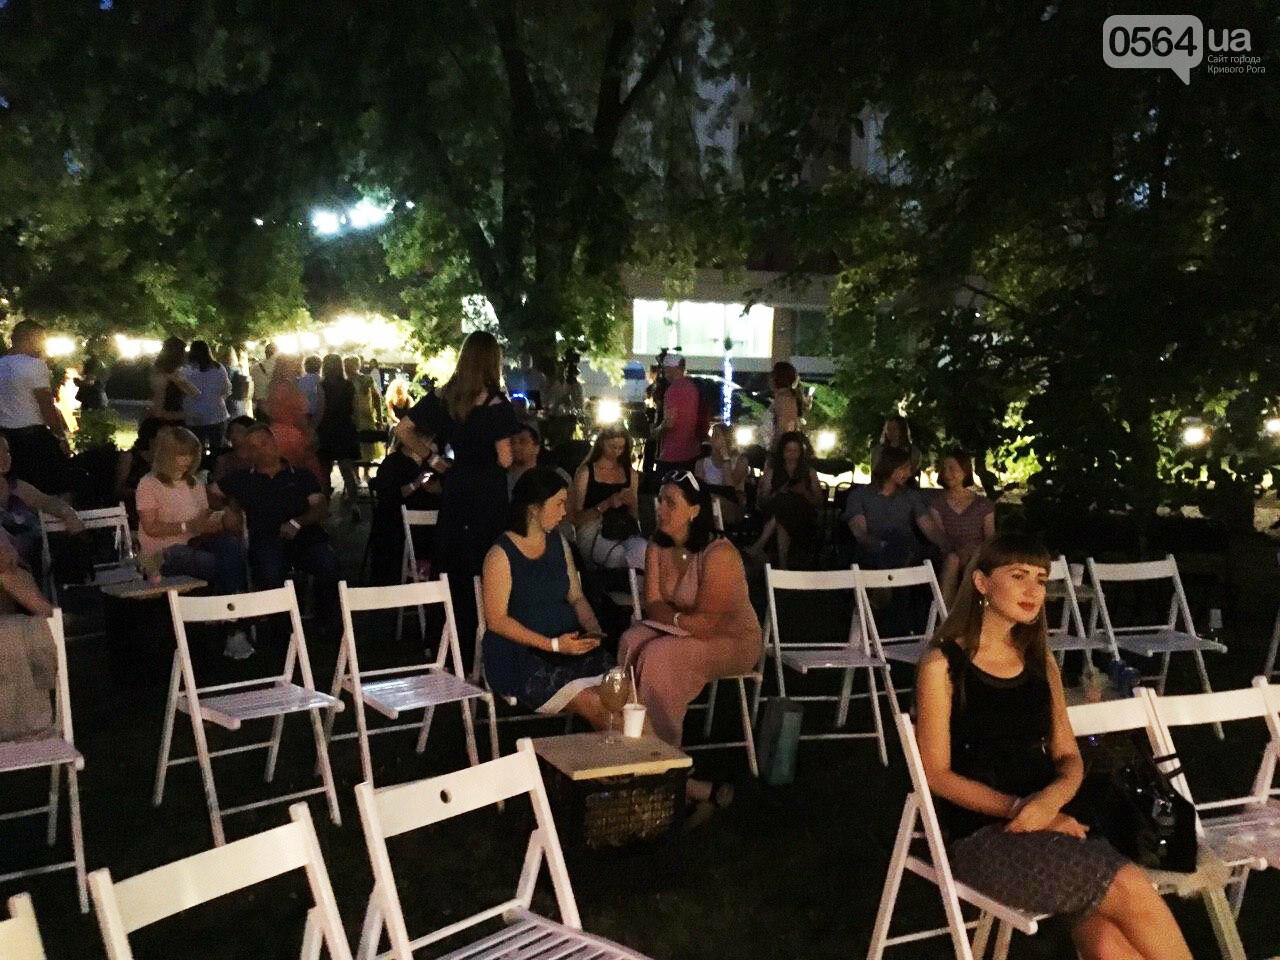 Под звездным небом криворожане наслаждались летним джазом от  Advantage Project, - ФОТО, ВИДЕО , фото-5